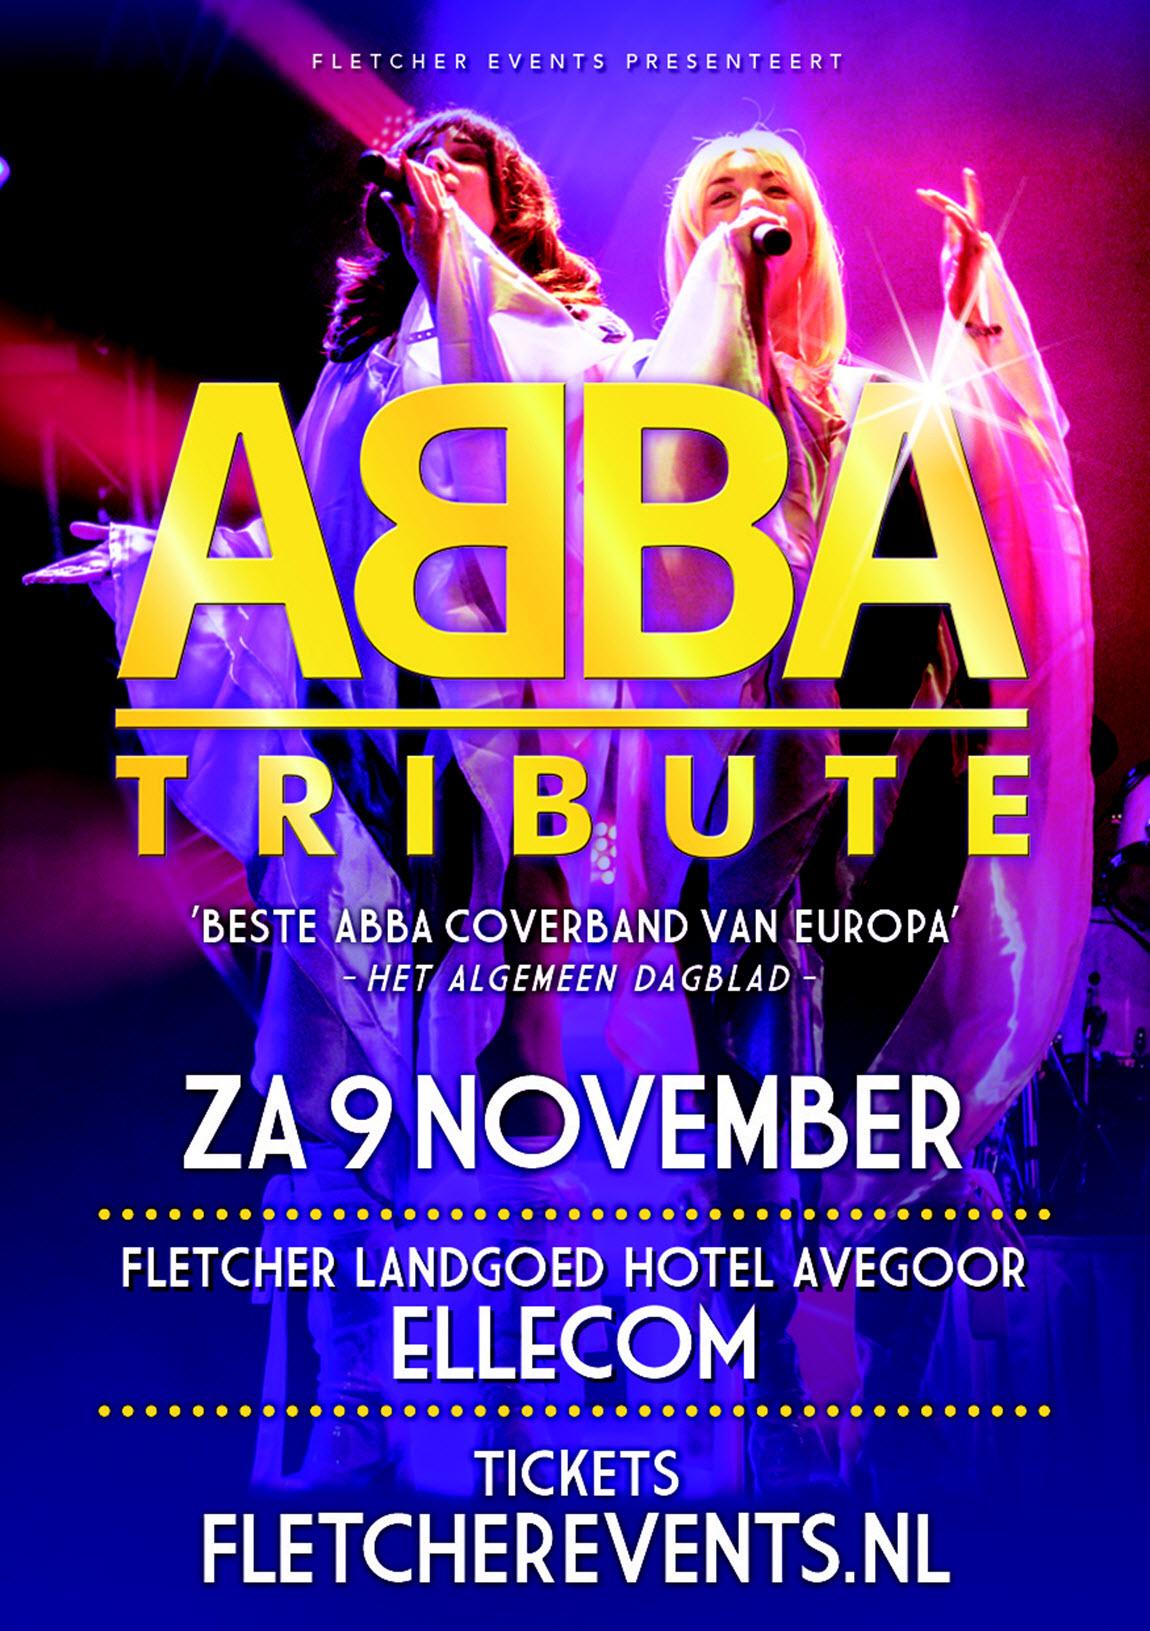 ABBA Tribute - Fletcher Landgoed Hotel Avegoor Ellecom